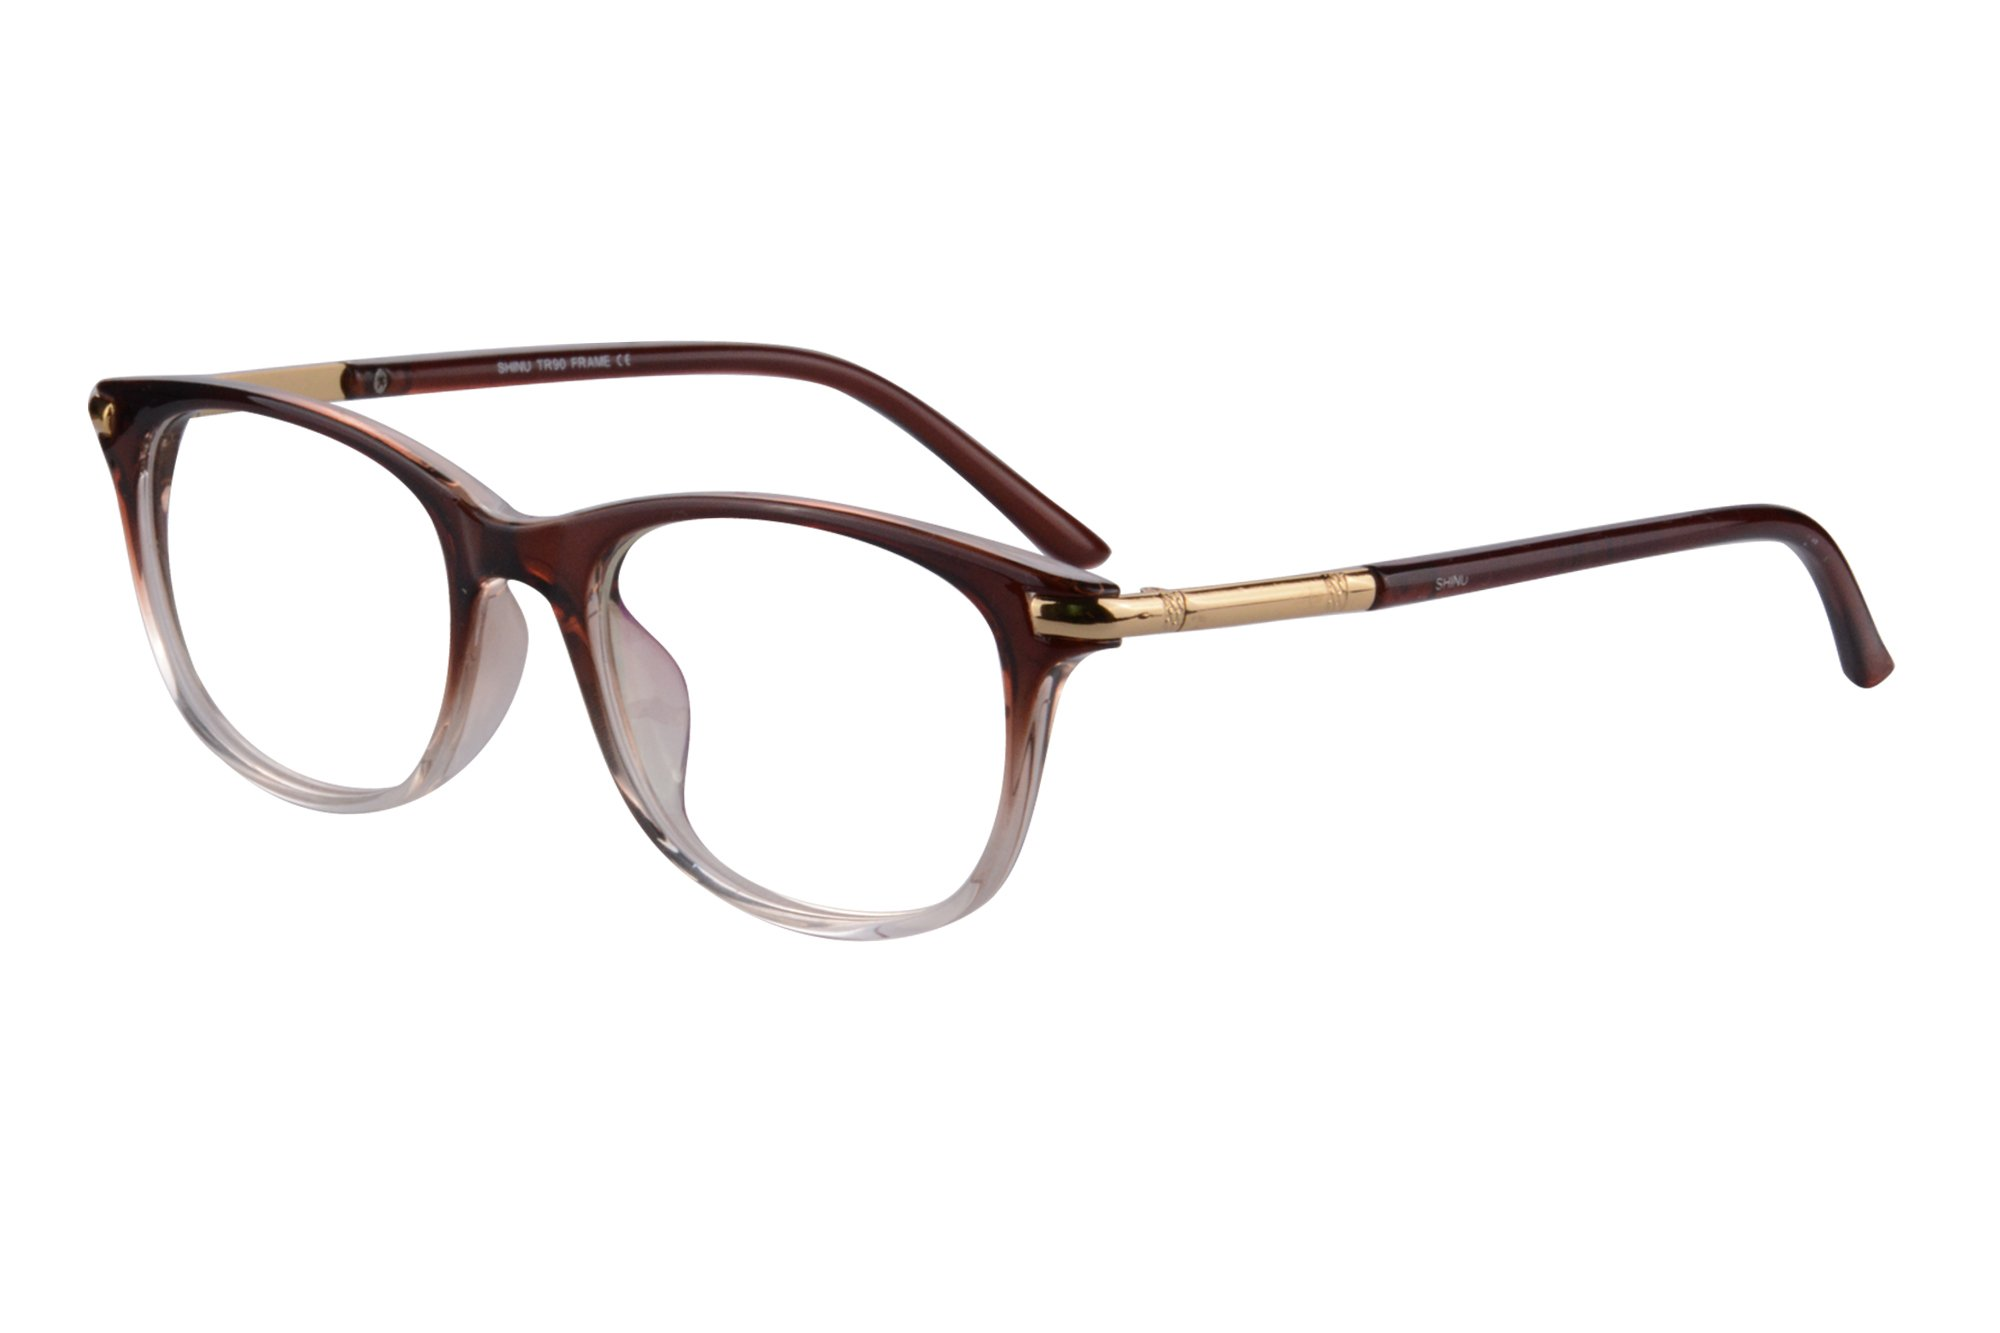 MEDOLONG Women's Anti Blue Light Progressive Multifocus Reading Glasses-MF17(C4,anti-blue,up+0.00,down+2.50)